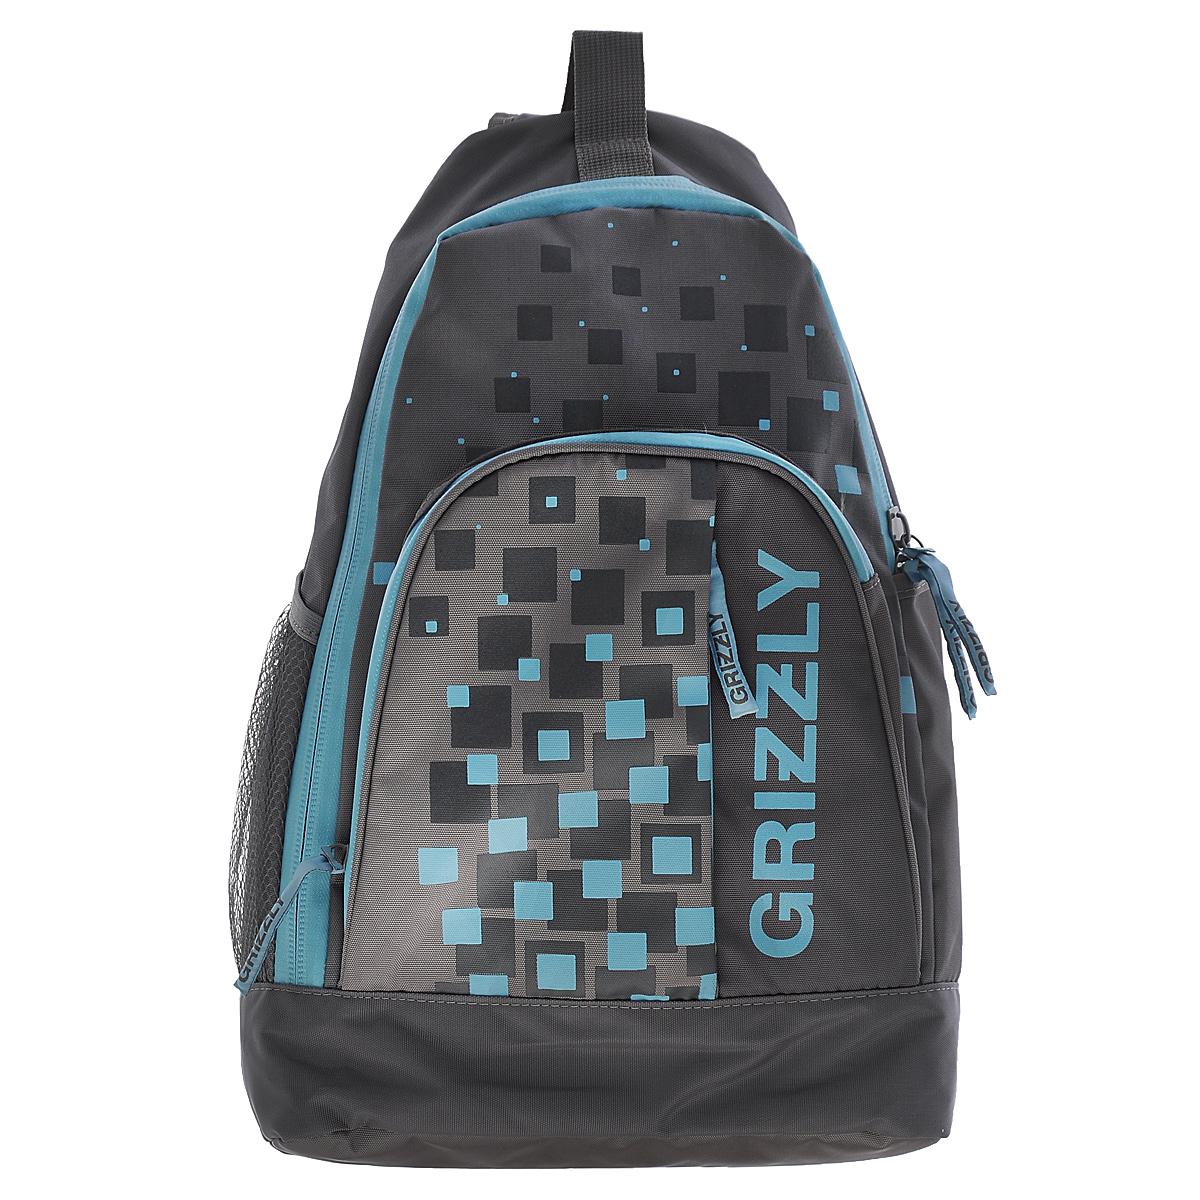 Рюкзак городской Grizzly, цвет: серый, голубой, 24 л. RU-510-2/1 рюкзаки grizzly рюкзак